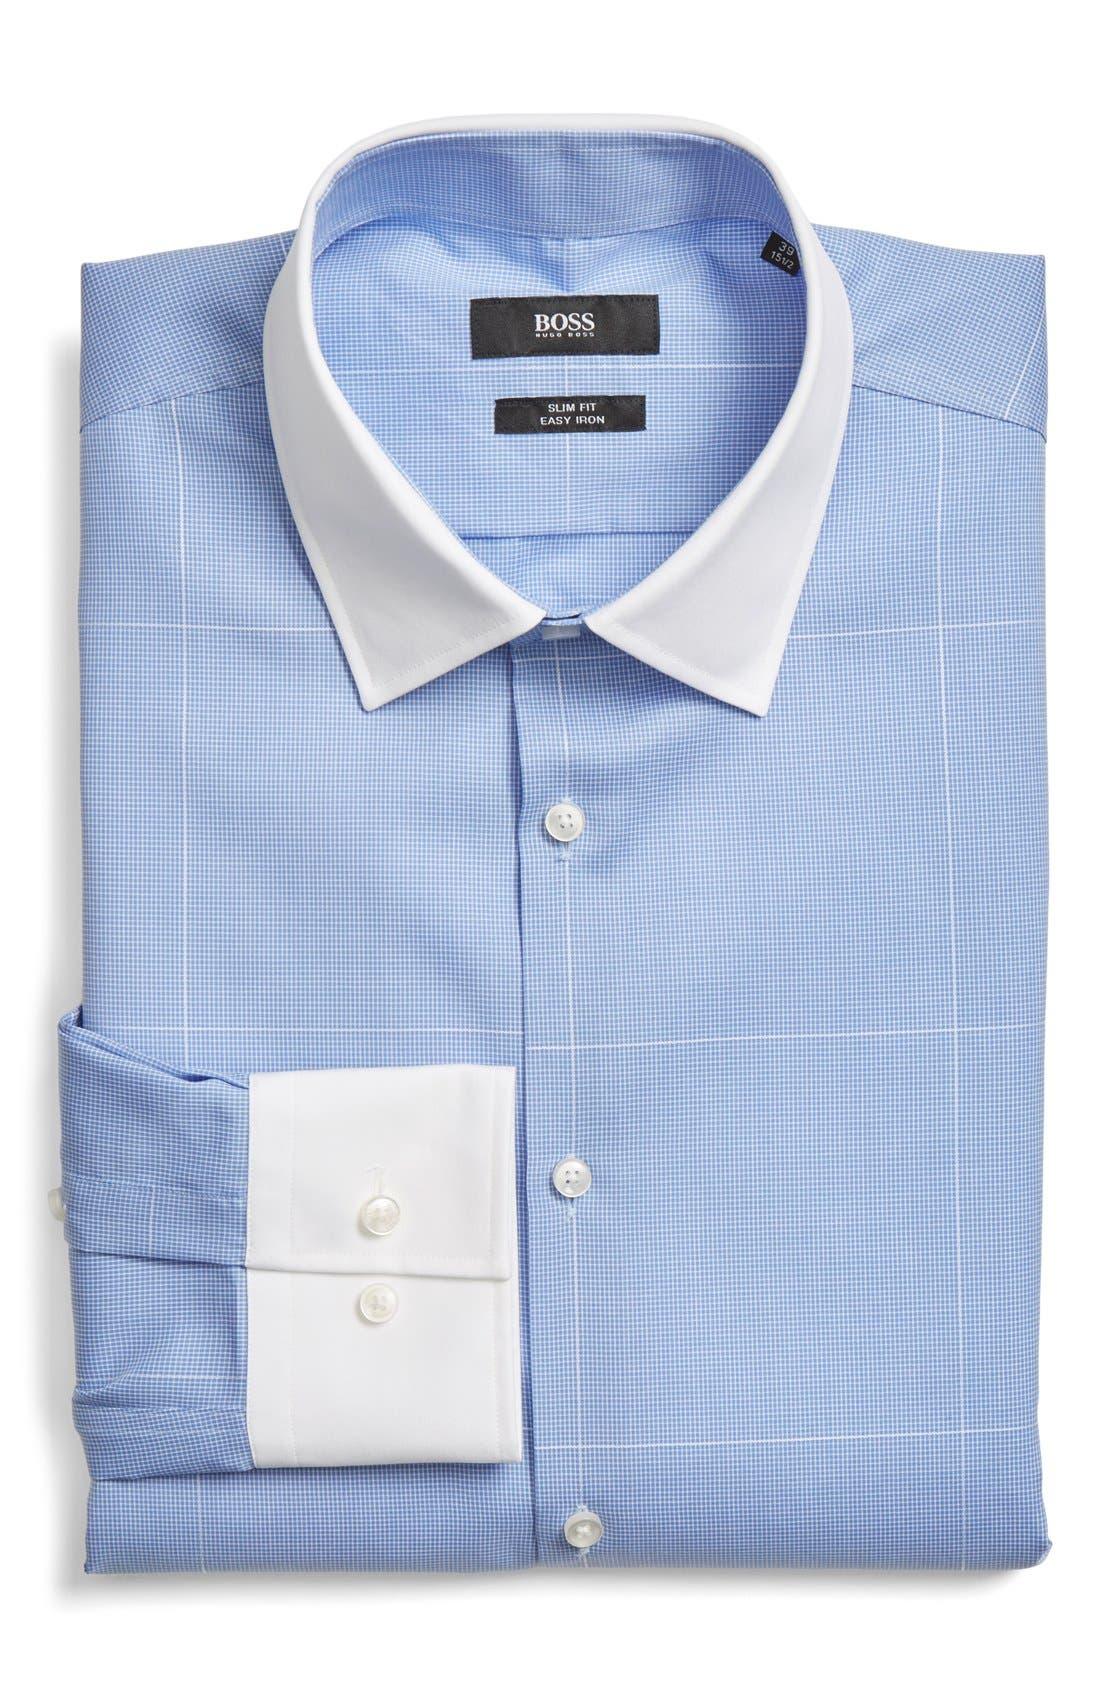 Main Image - BOSS WW Slim Fit Easy Iron Check Dress Shirt